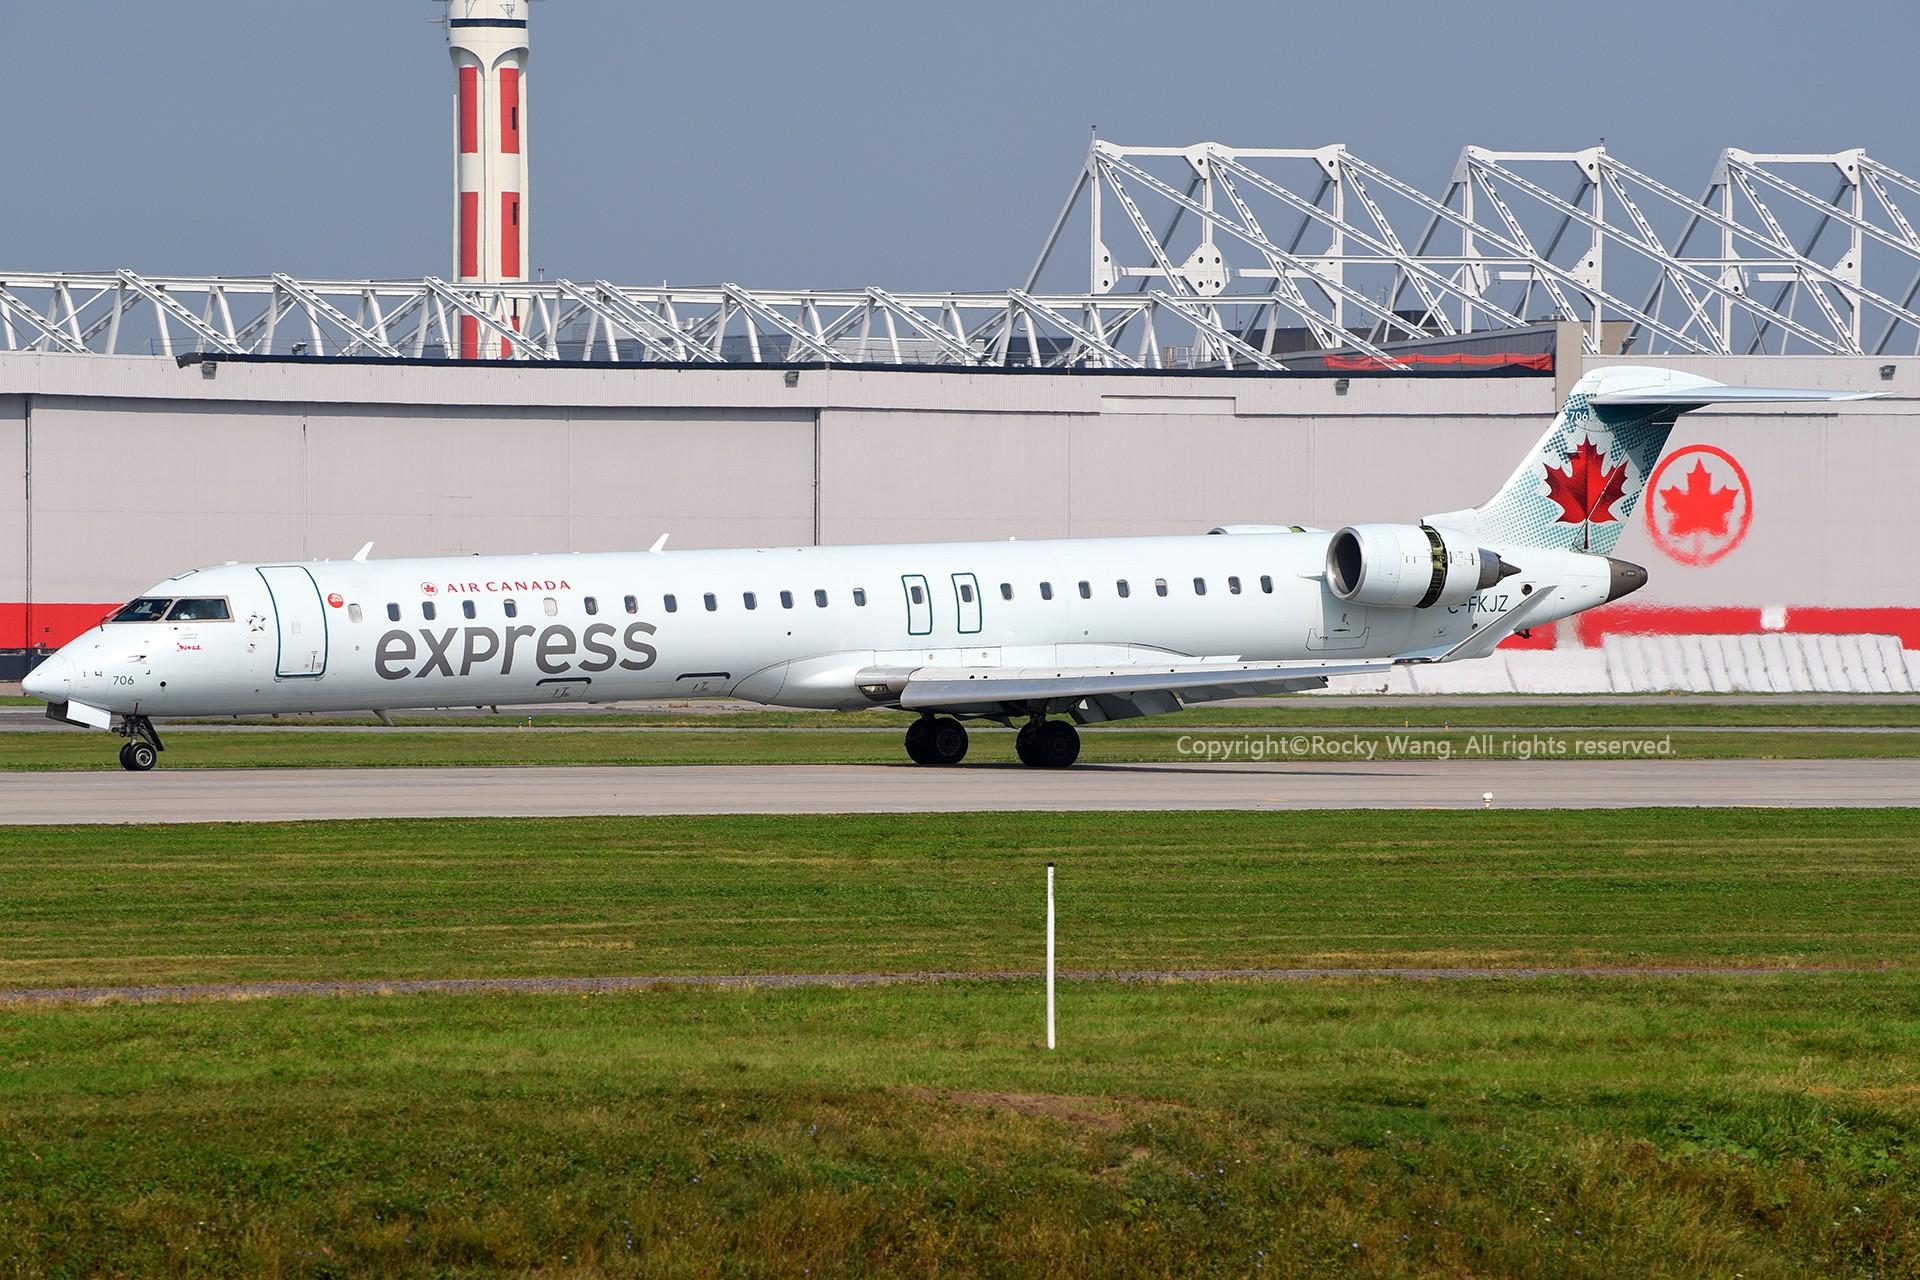 Re:[原创]CYUL 30图 BOMBARDIER CRJ-705LR C-FKJZ Montreal Pierre Elliott Trudeau Int'l Ai